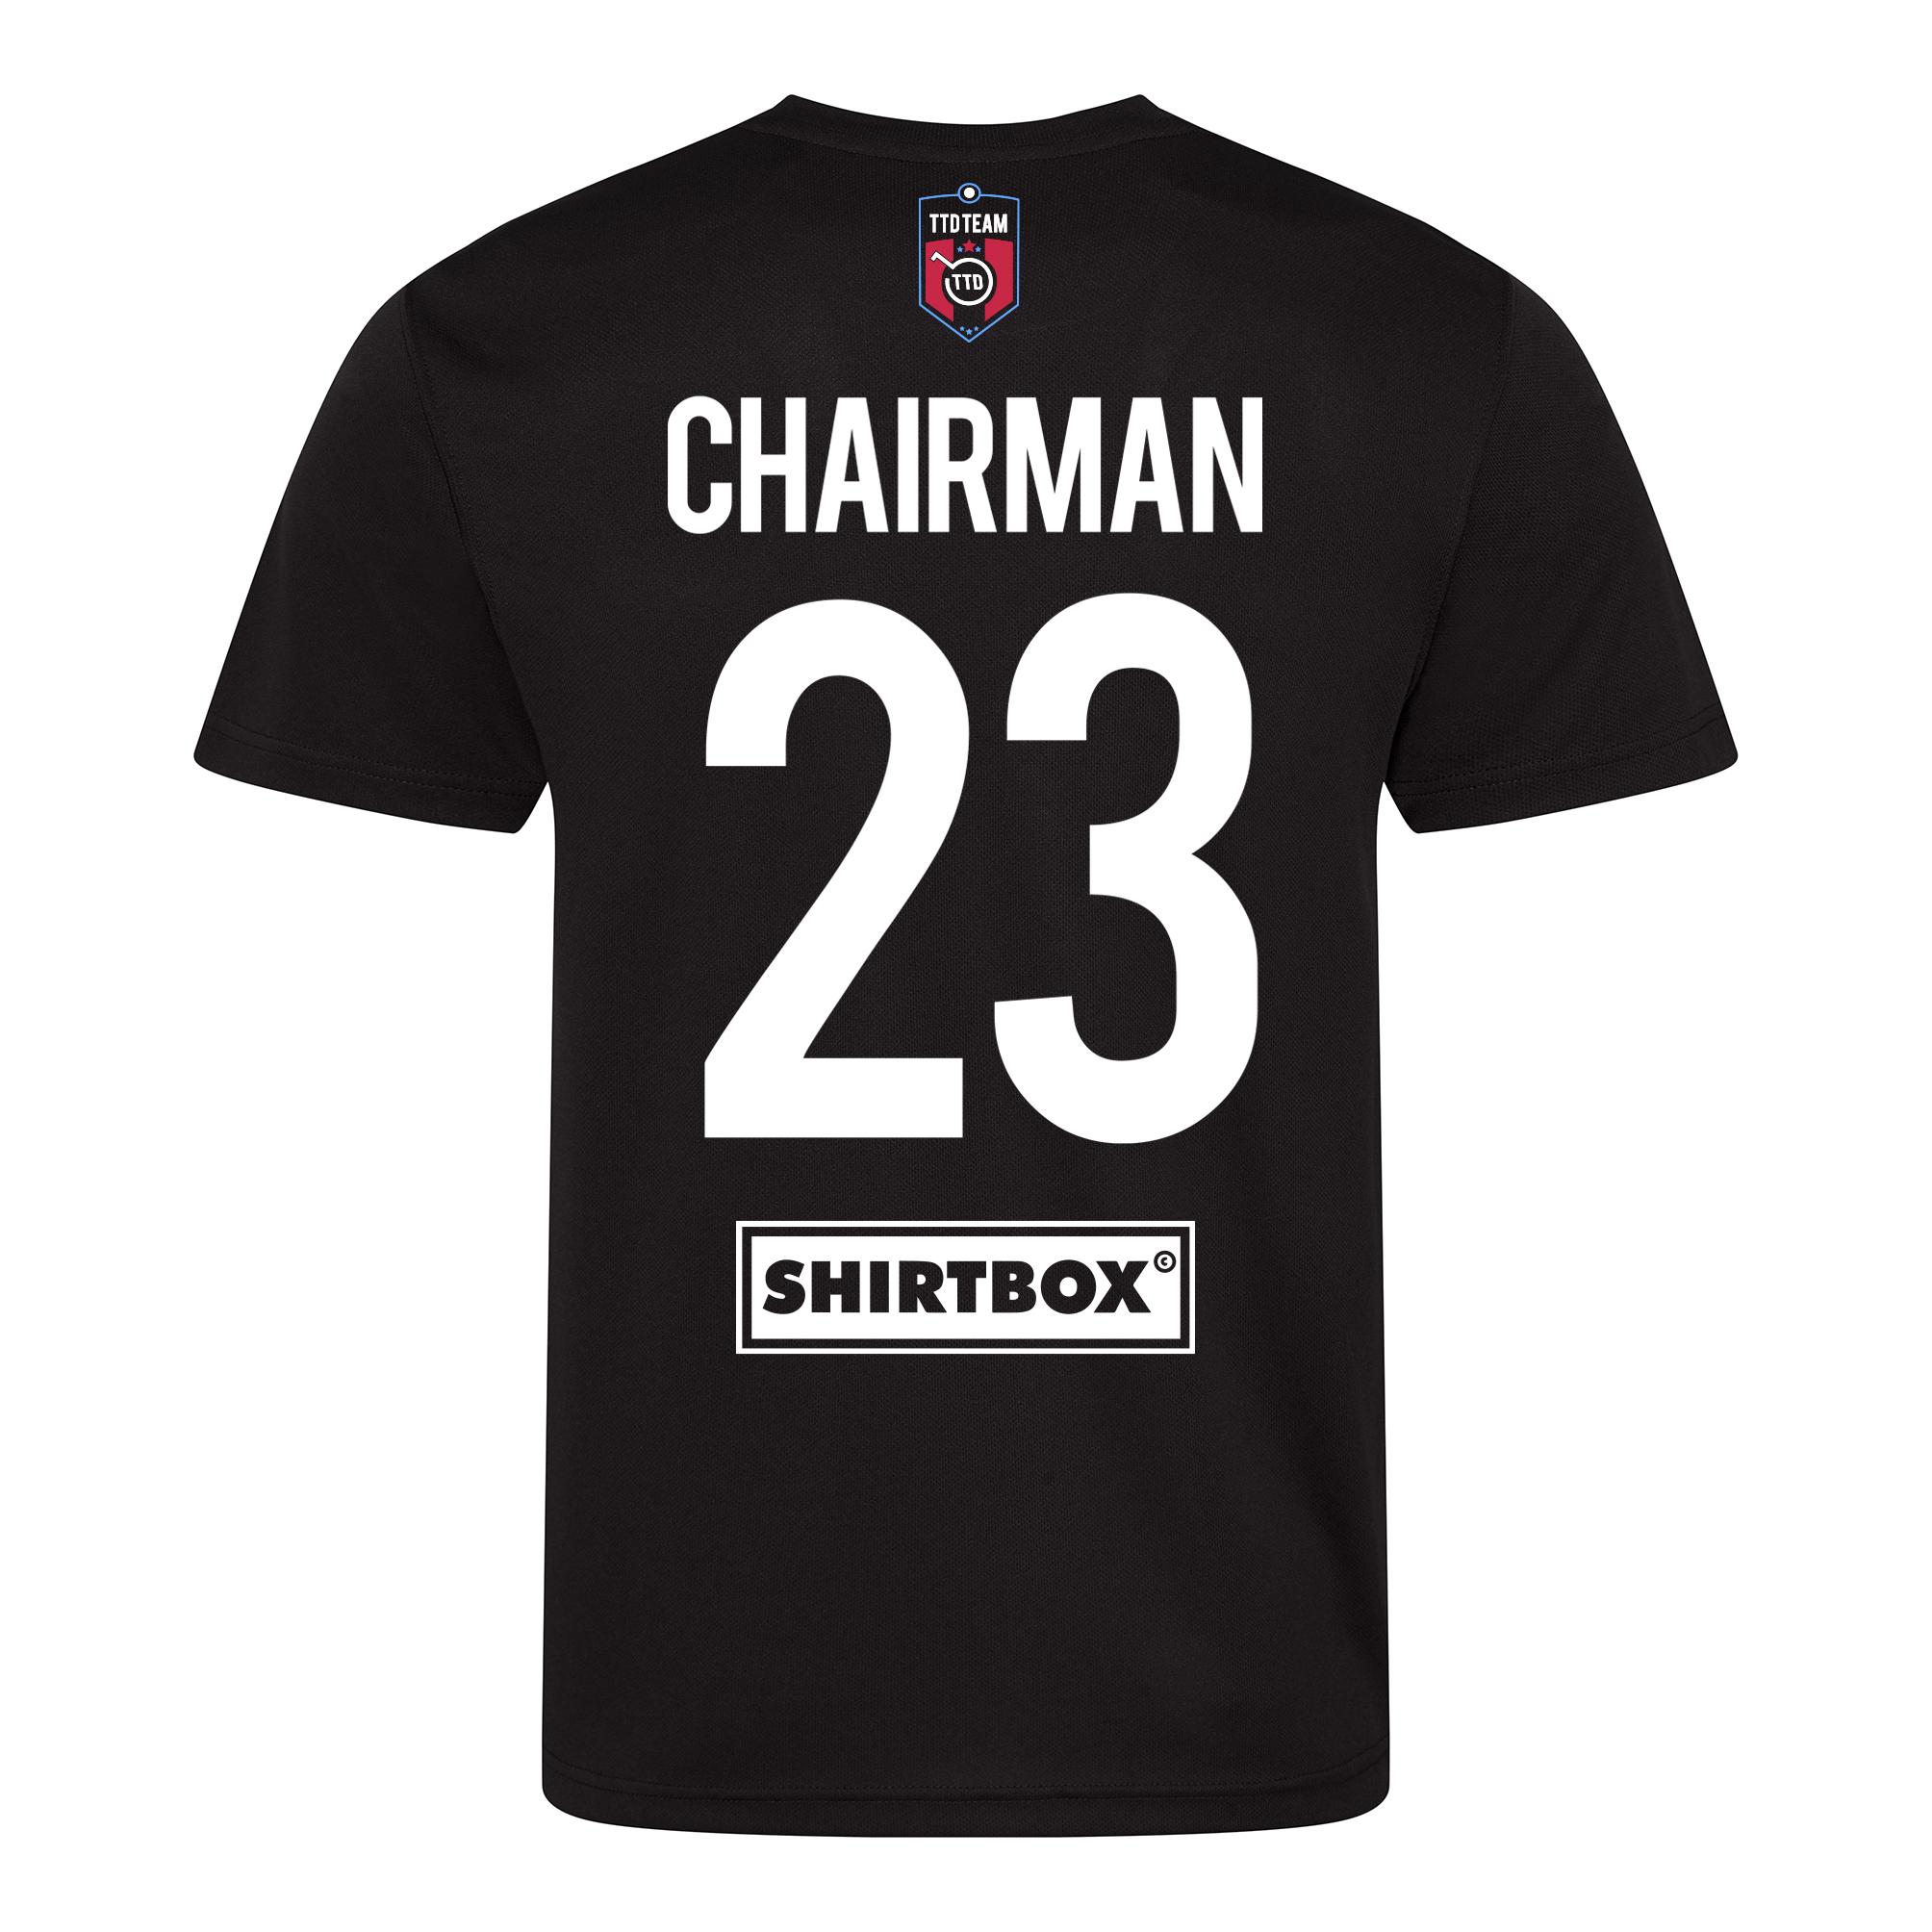 23 - Chairman